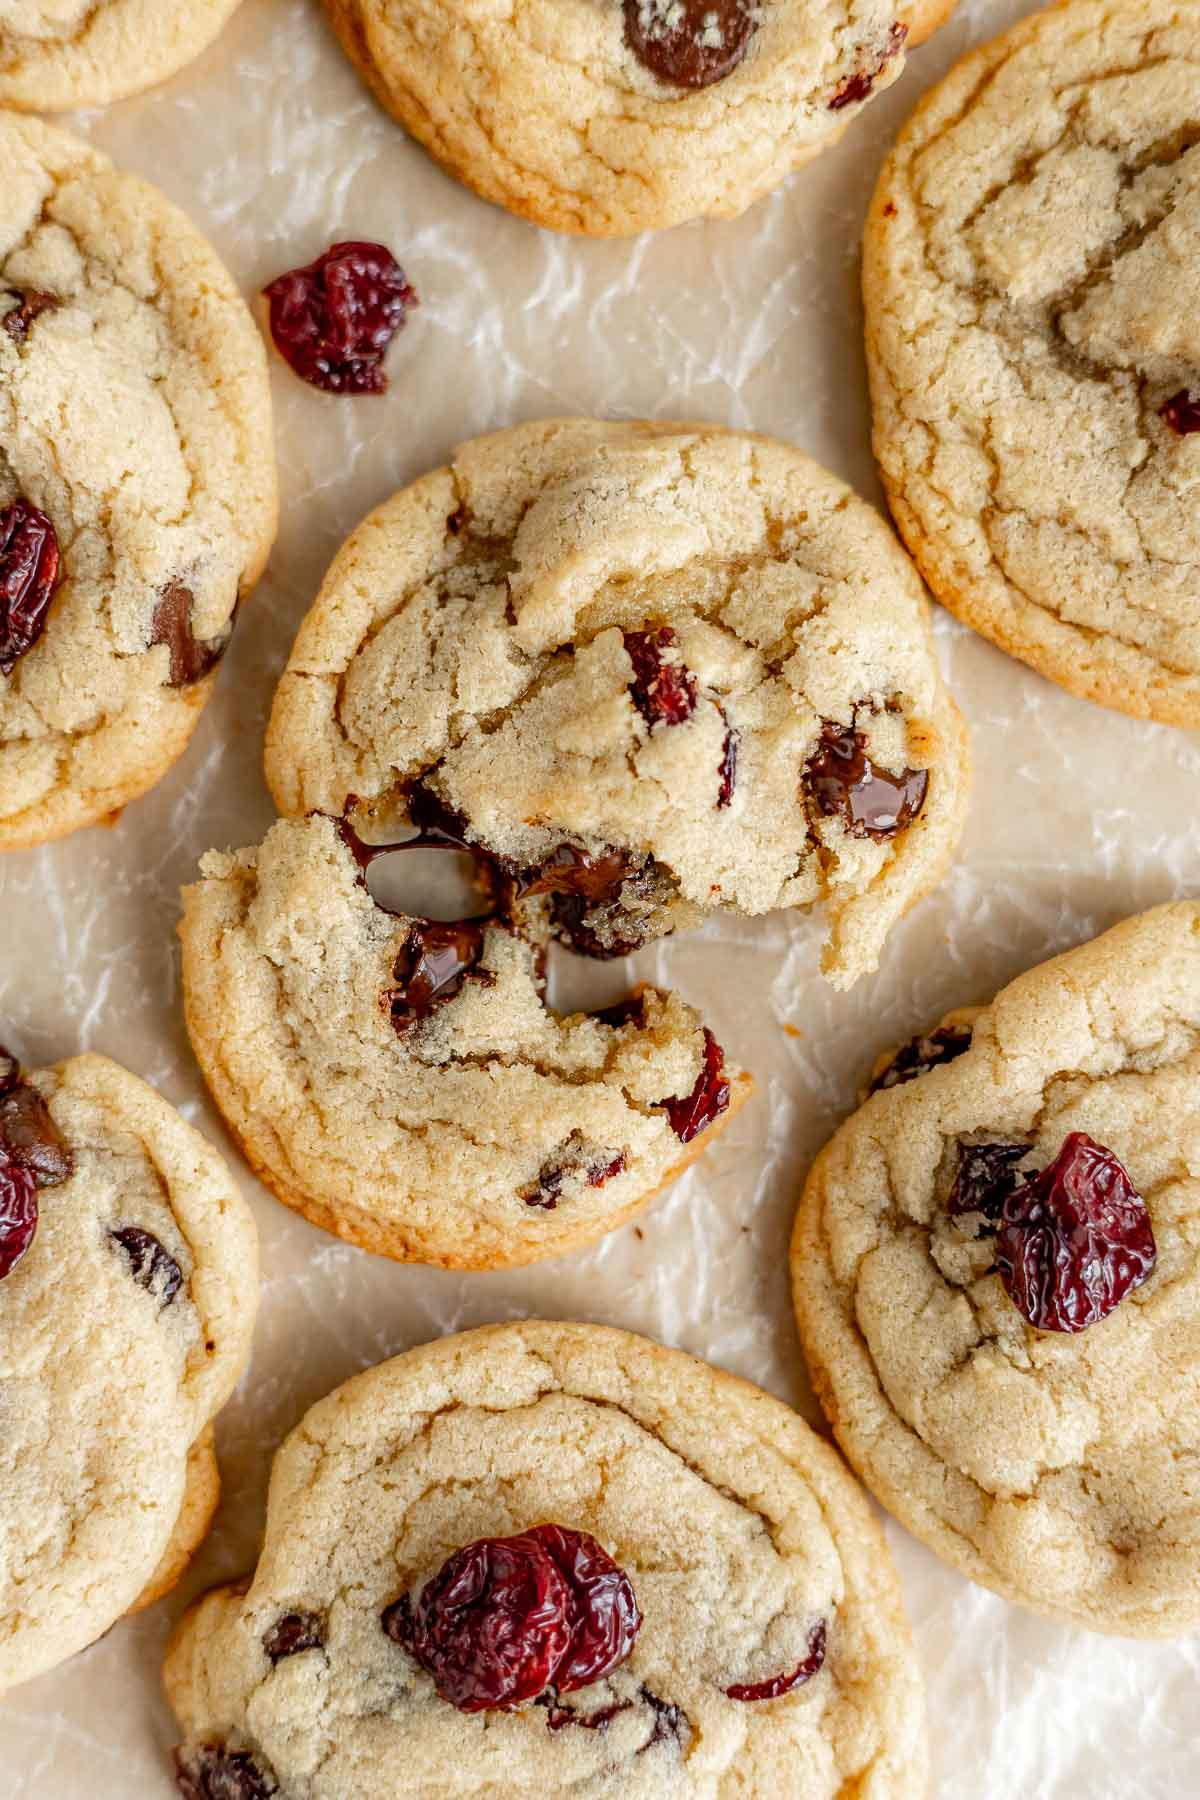 Cherry Chocolate Chunk Cookies on cookie sheet